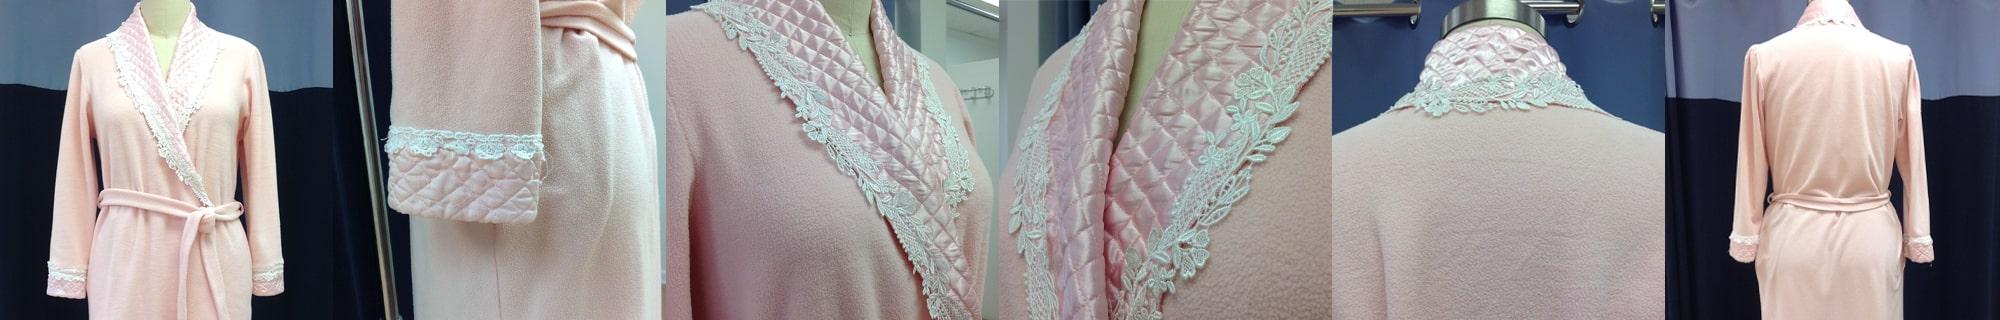 Garment Copy